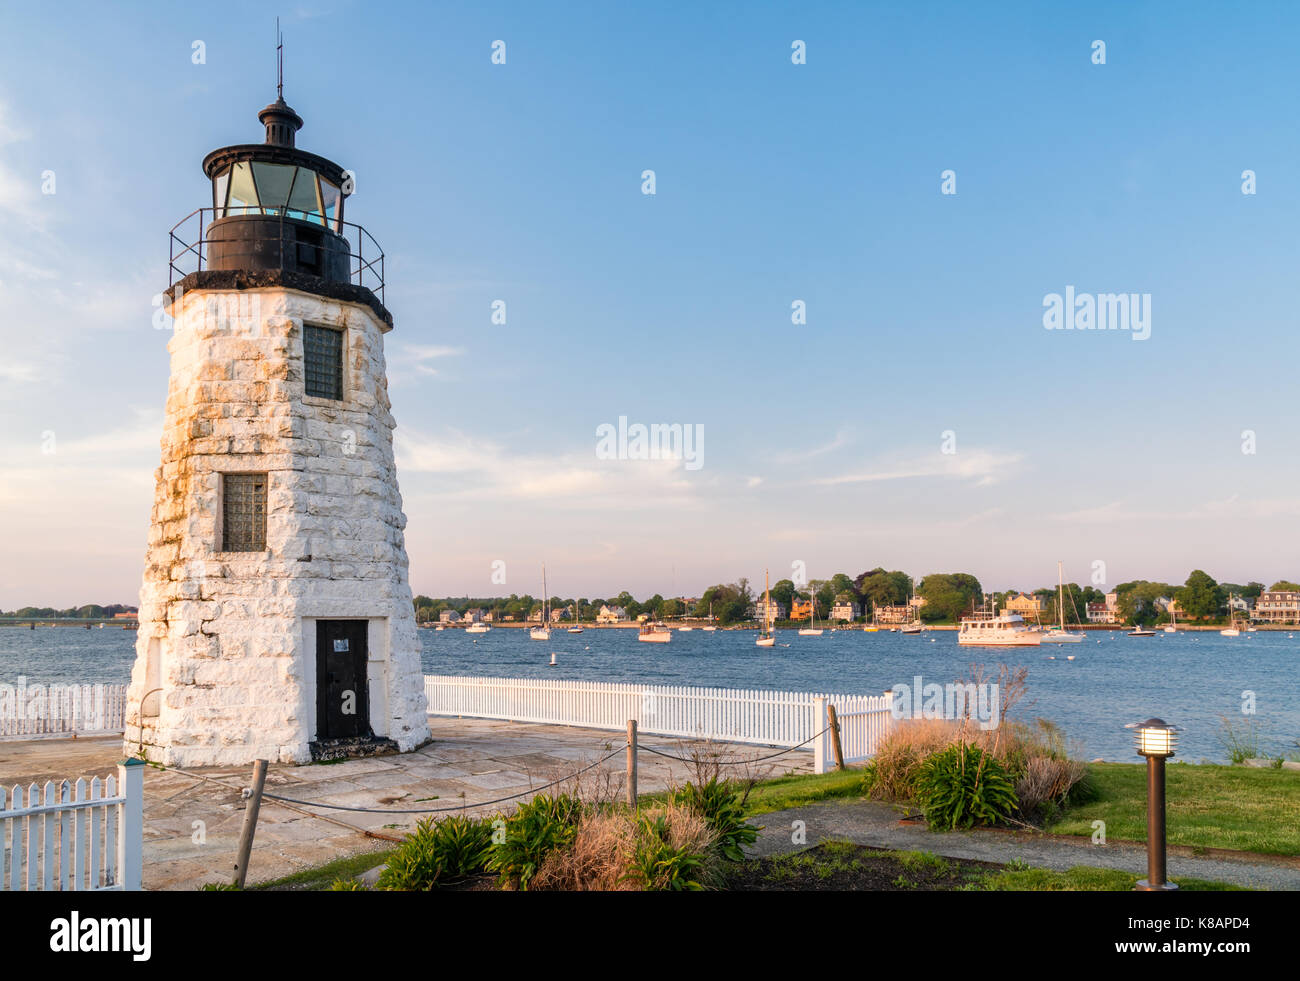 Newport Harbor (Goat Island) Lighthouse, Newport, Rhode Island - Stock Image